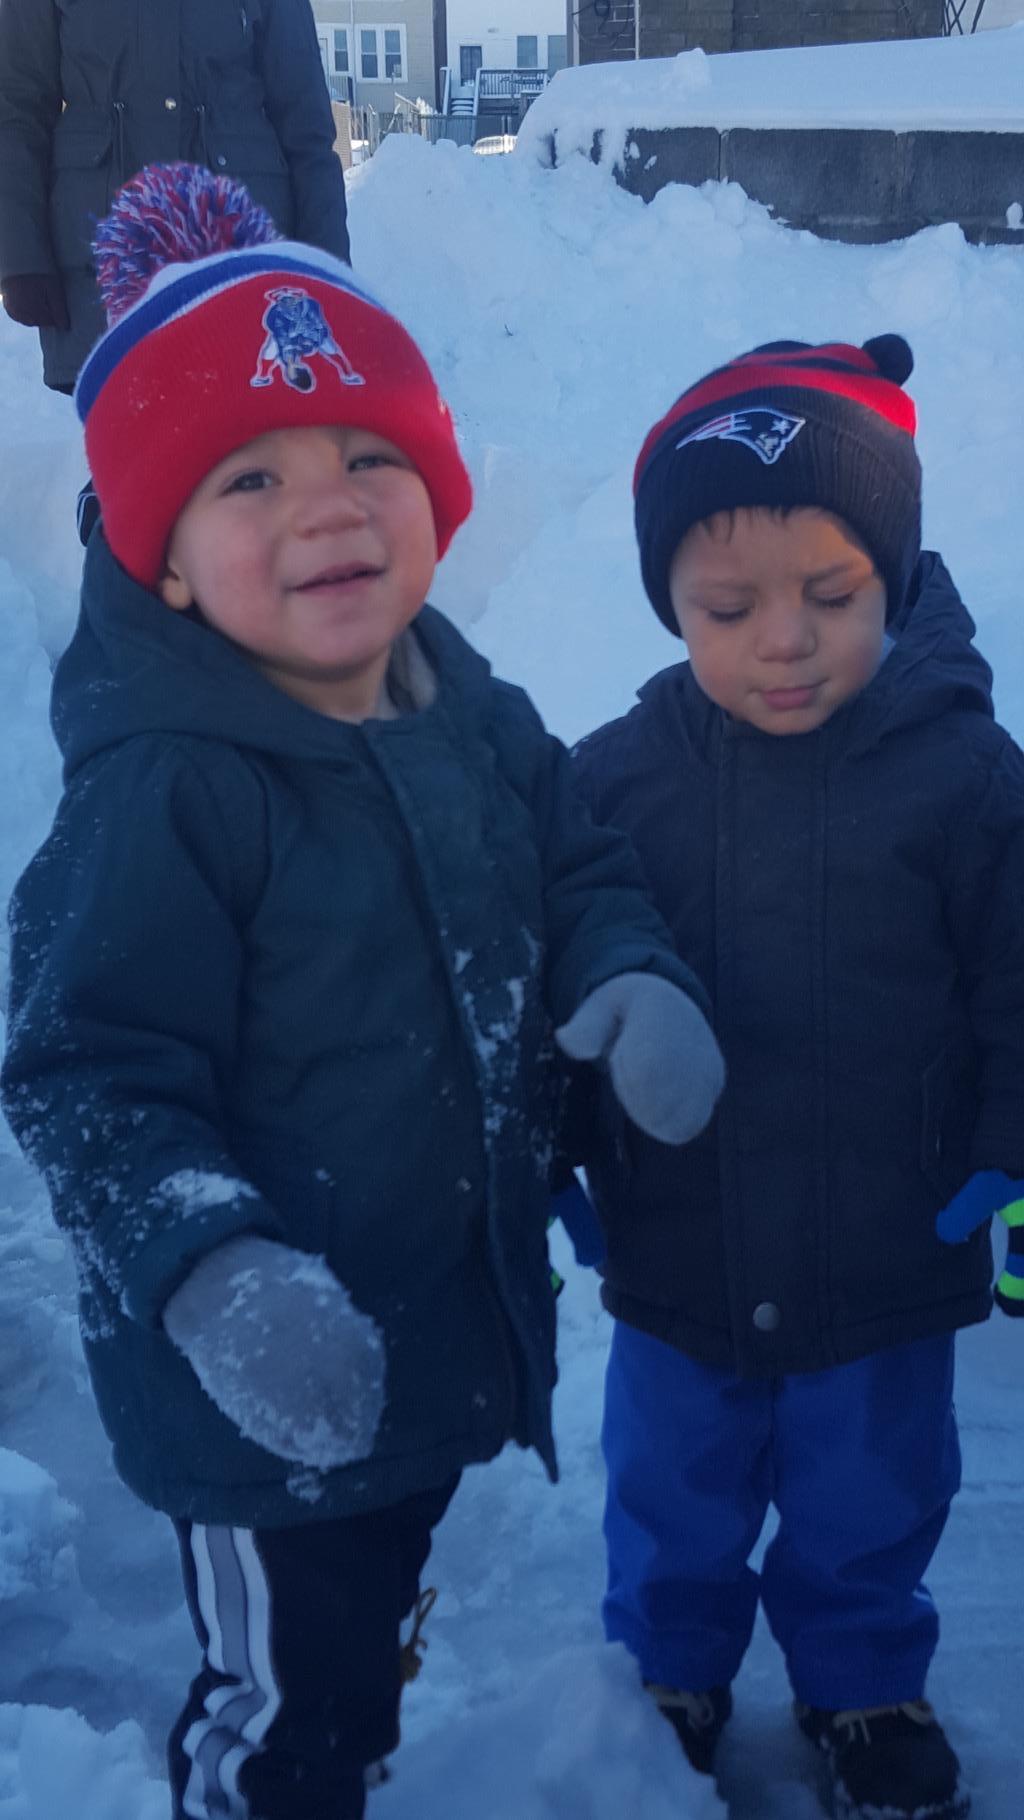 Twins Cole & Caden in the snow ( Photo: Ryan DaSilva)